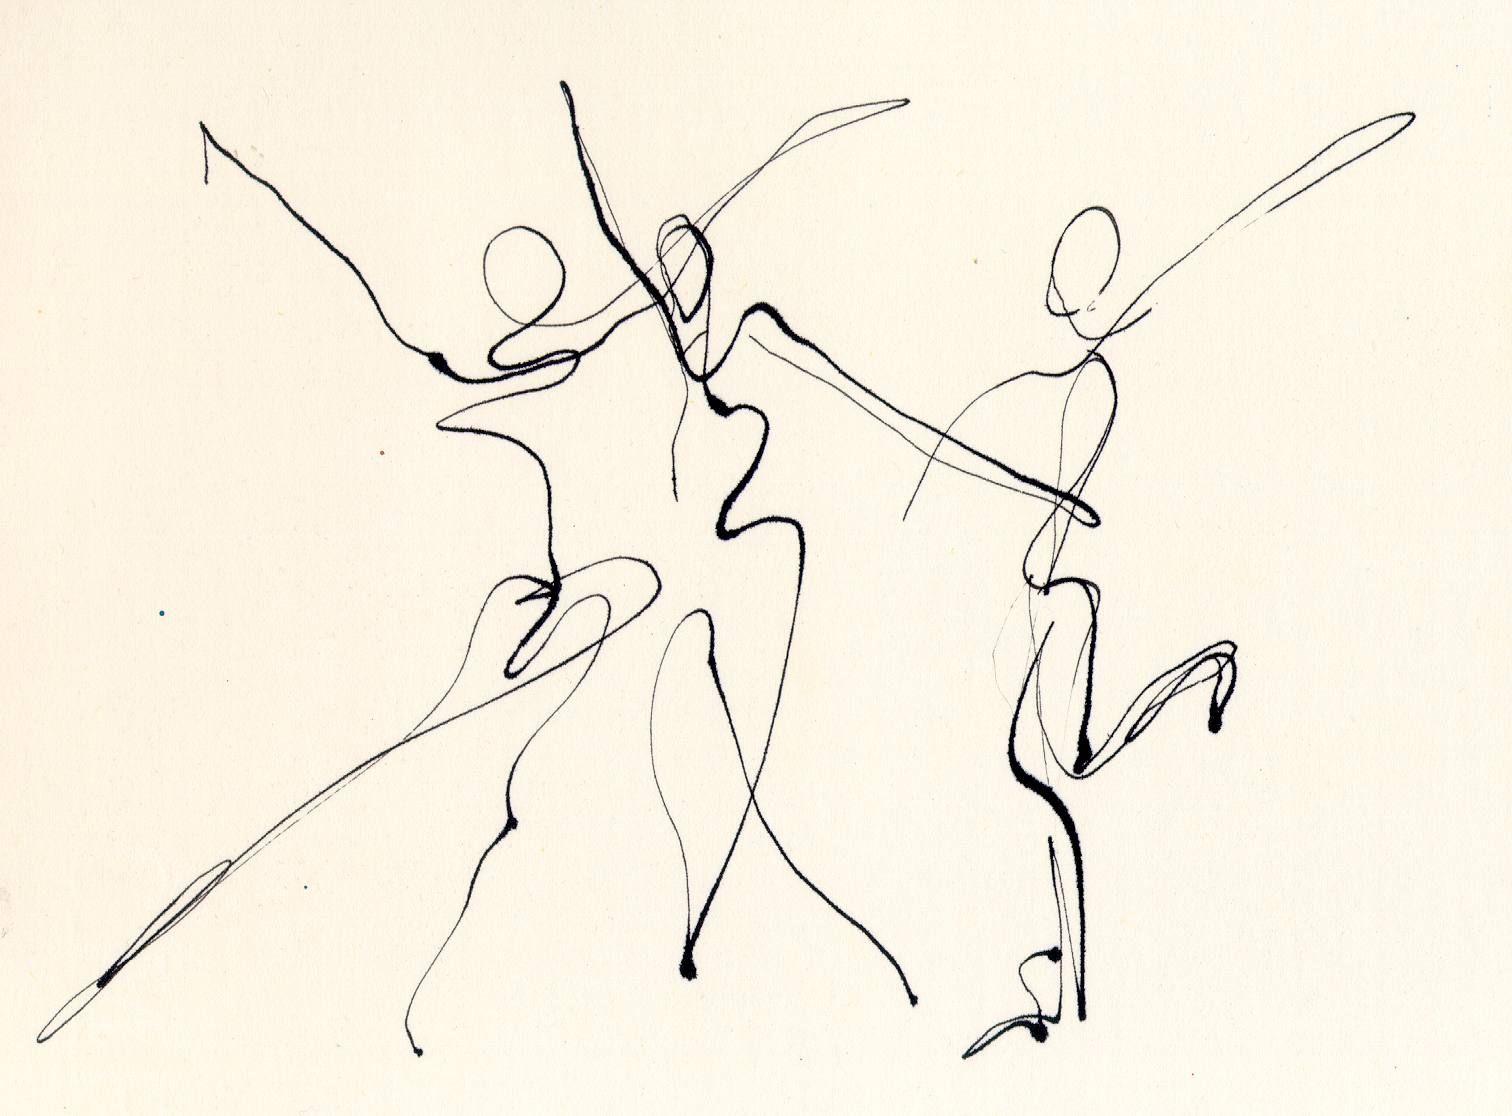 1512x1116 3 Dancers Line Drawing Chris Carter Artist Dip Pen Ink Web Chris